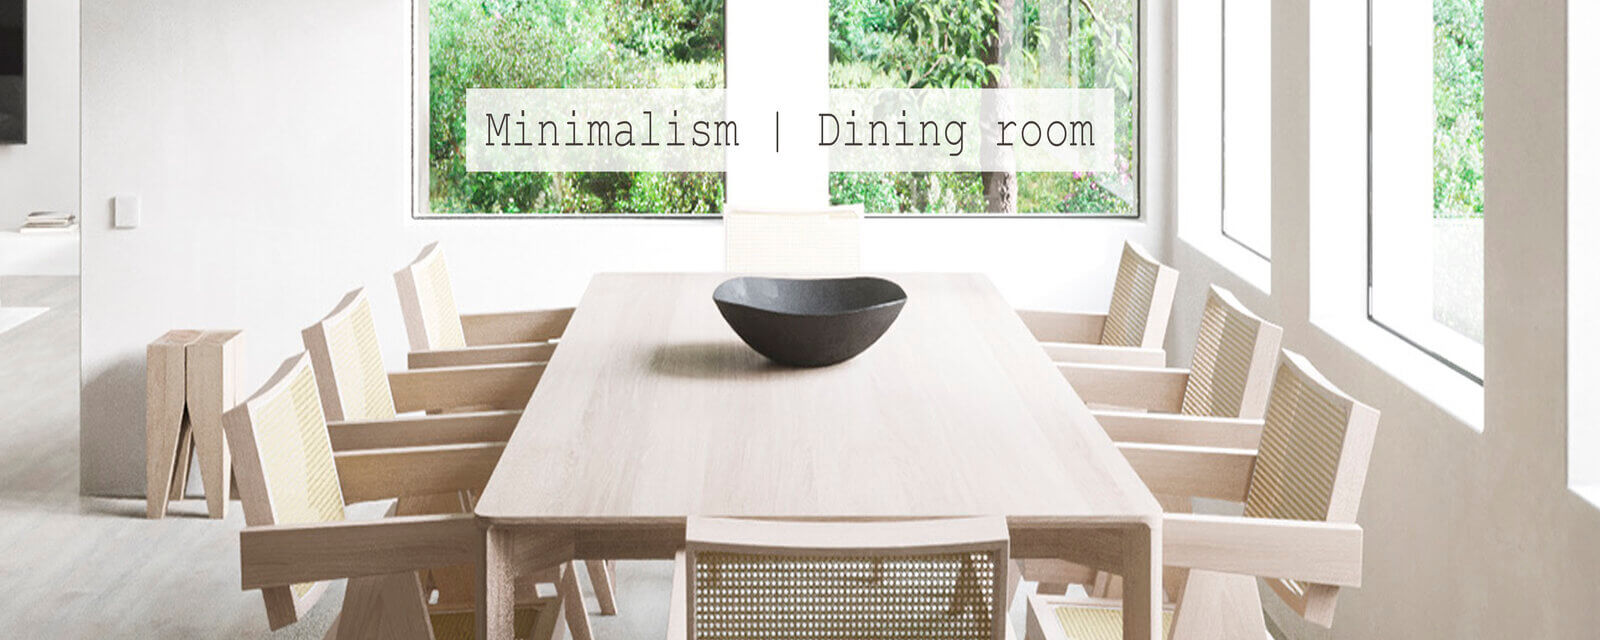 Minimalism | Dining Room